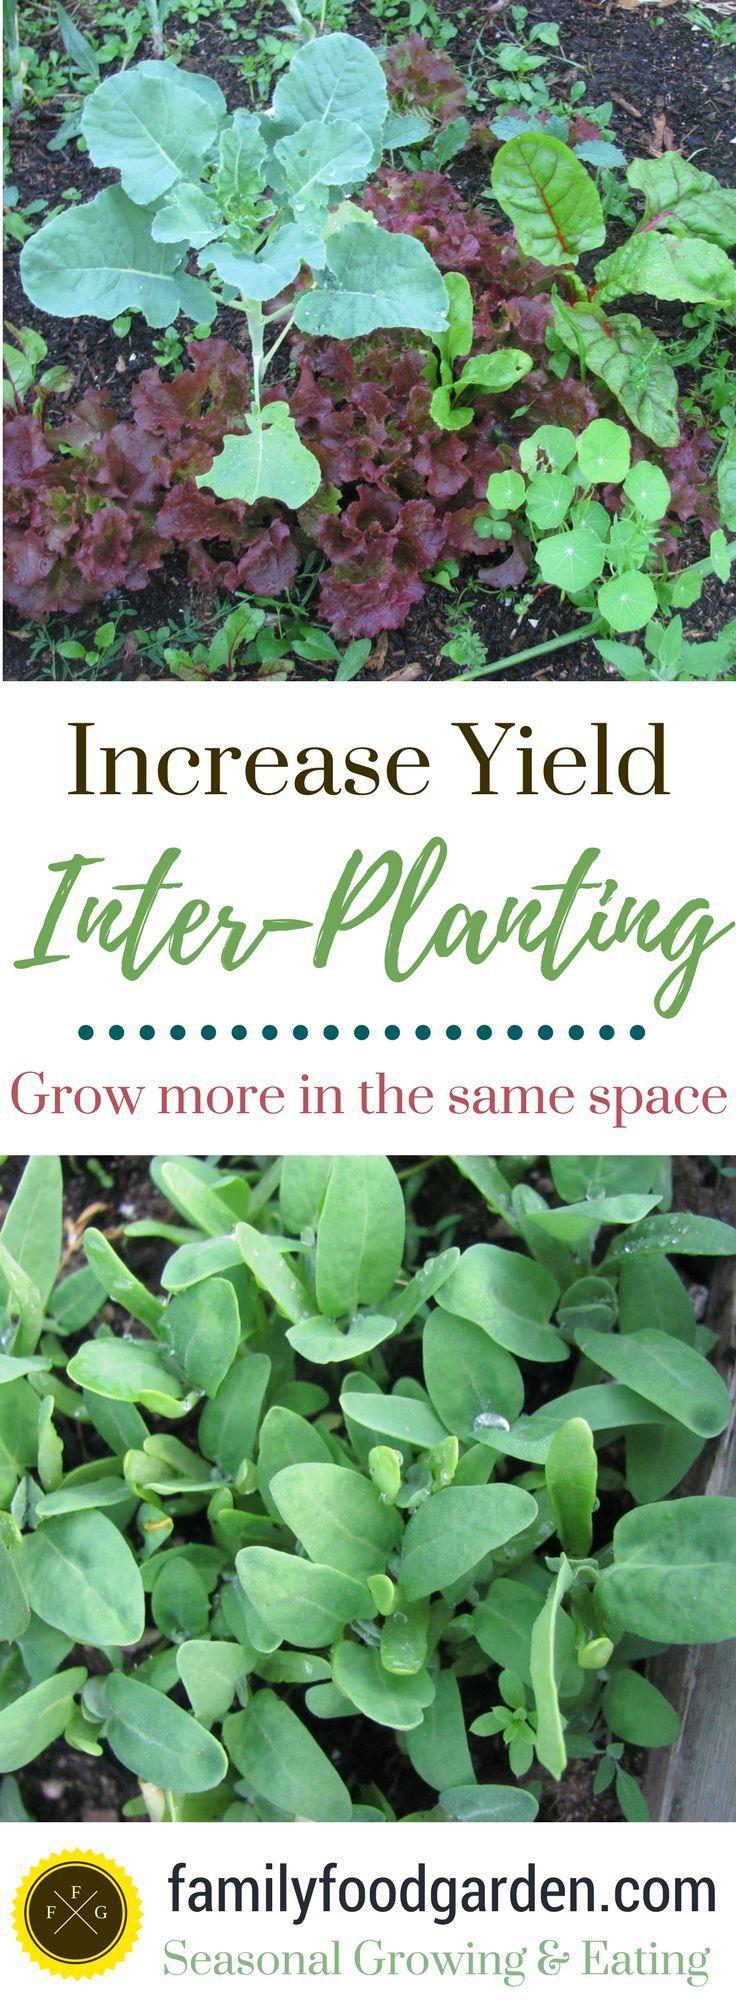 Inter-Planting for More Garden Yields - Family Food Garden